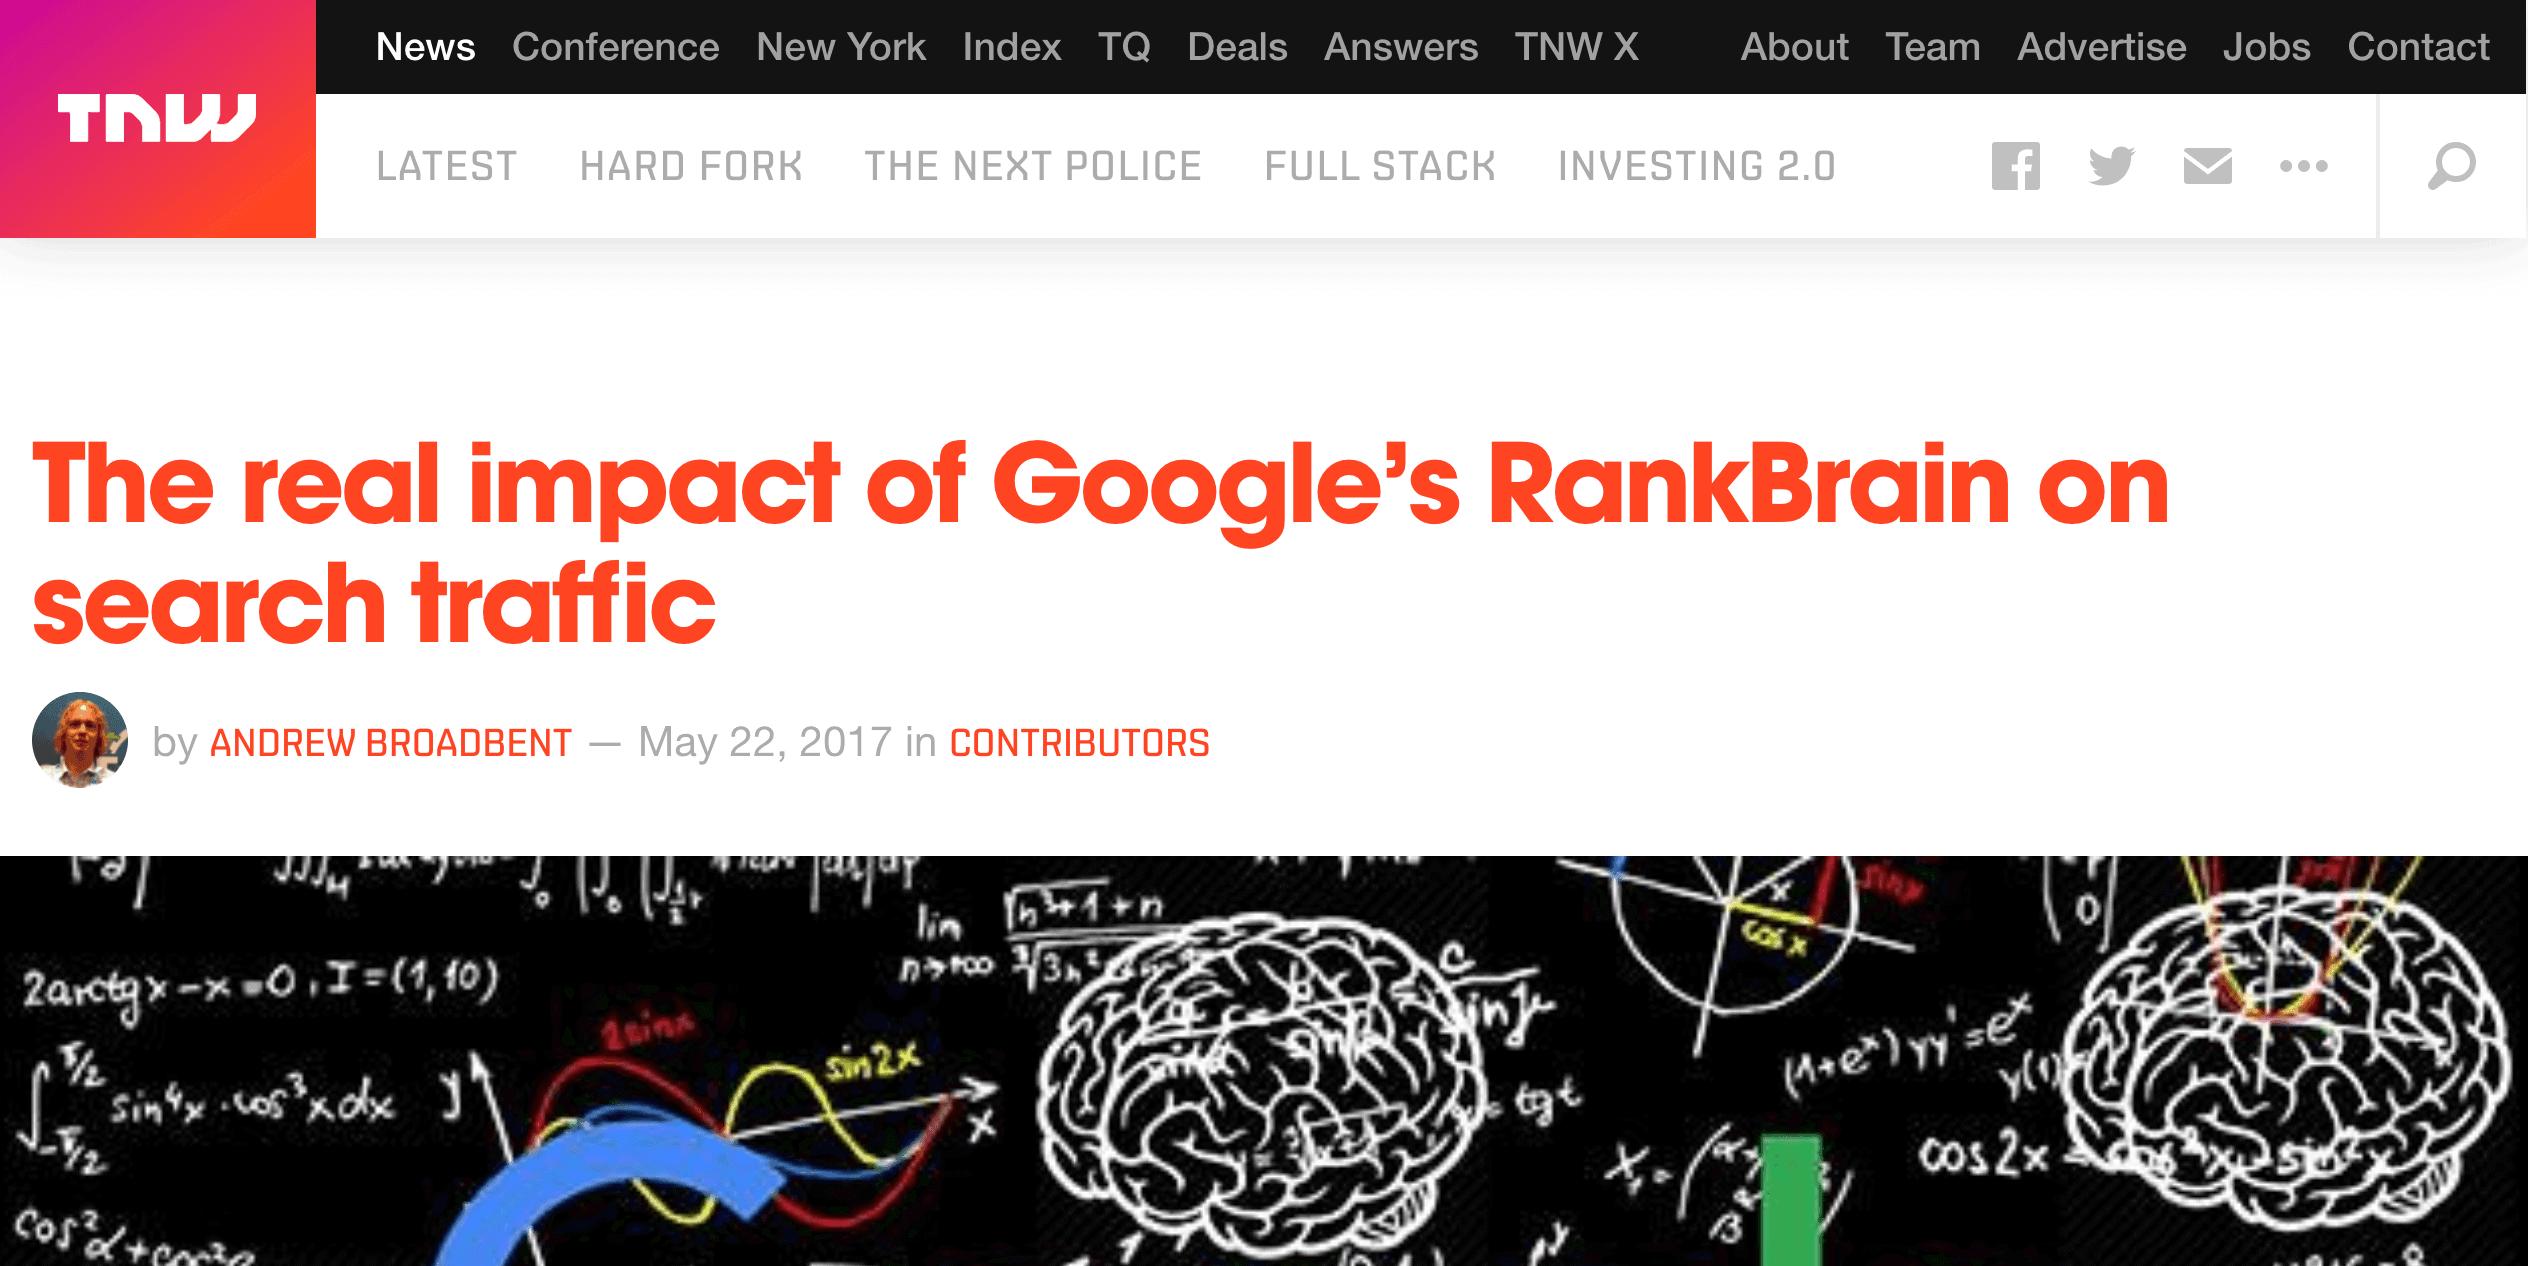 RankBrain article